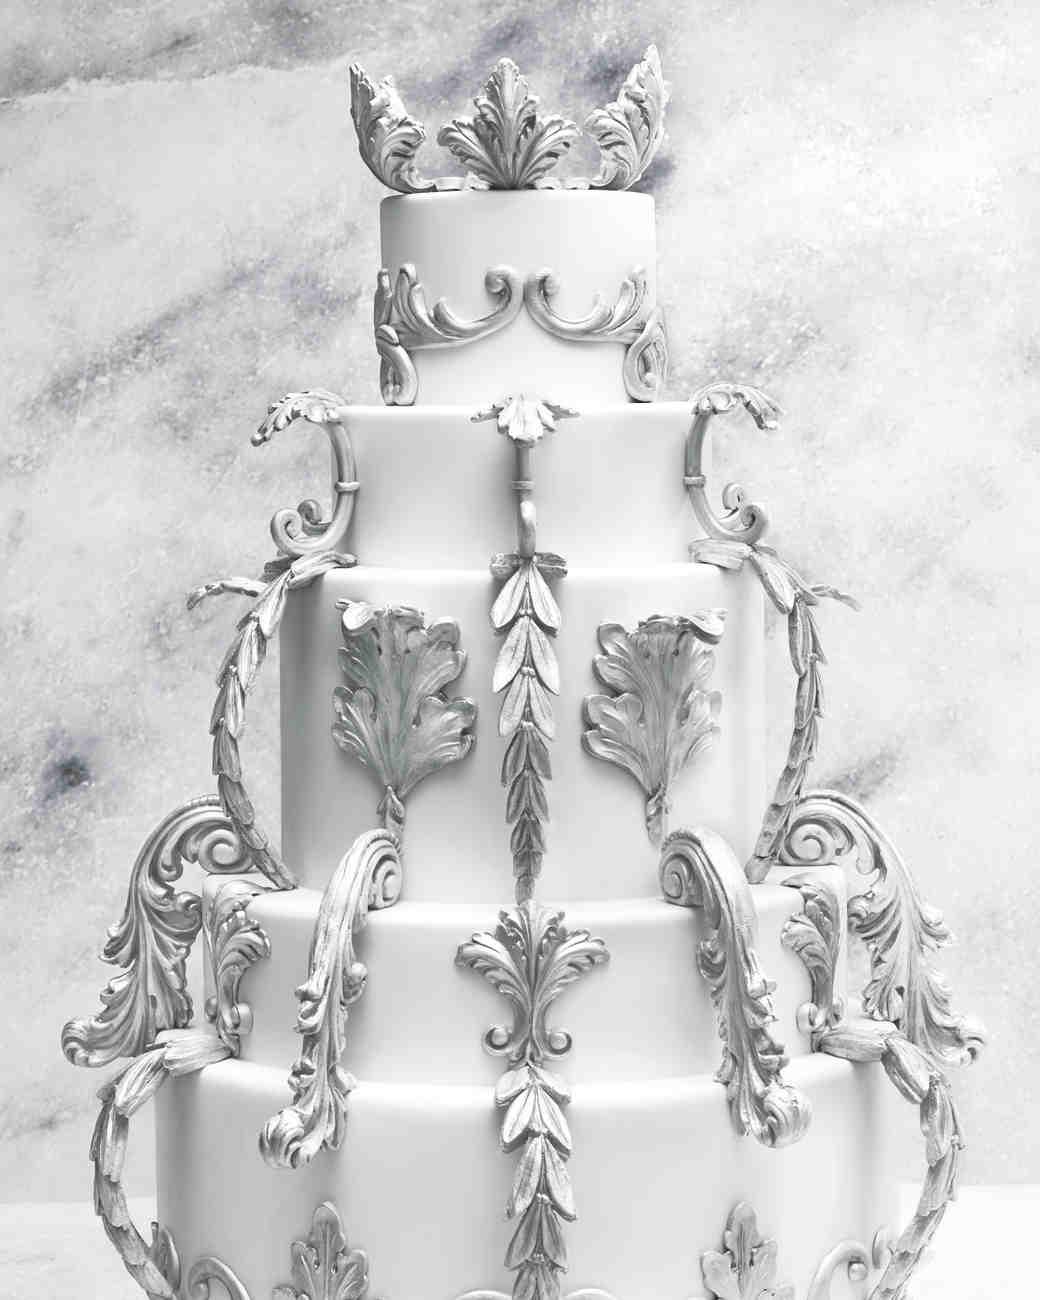 cake-6-119-d111517.jpg